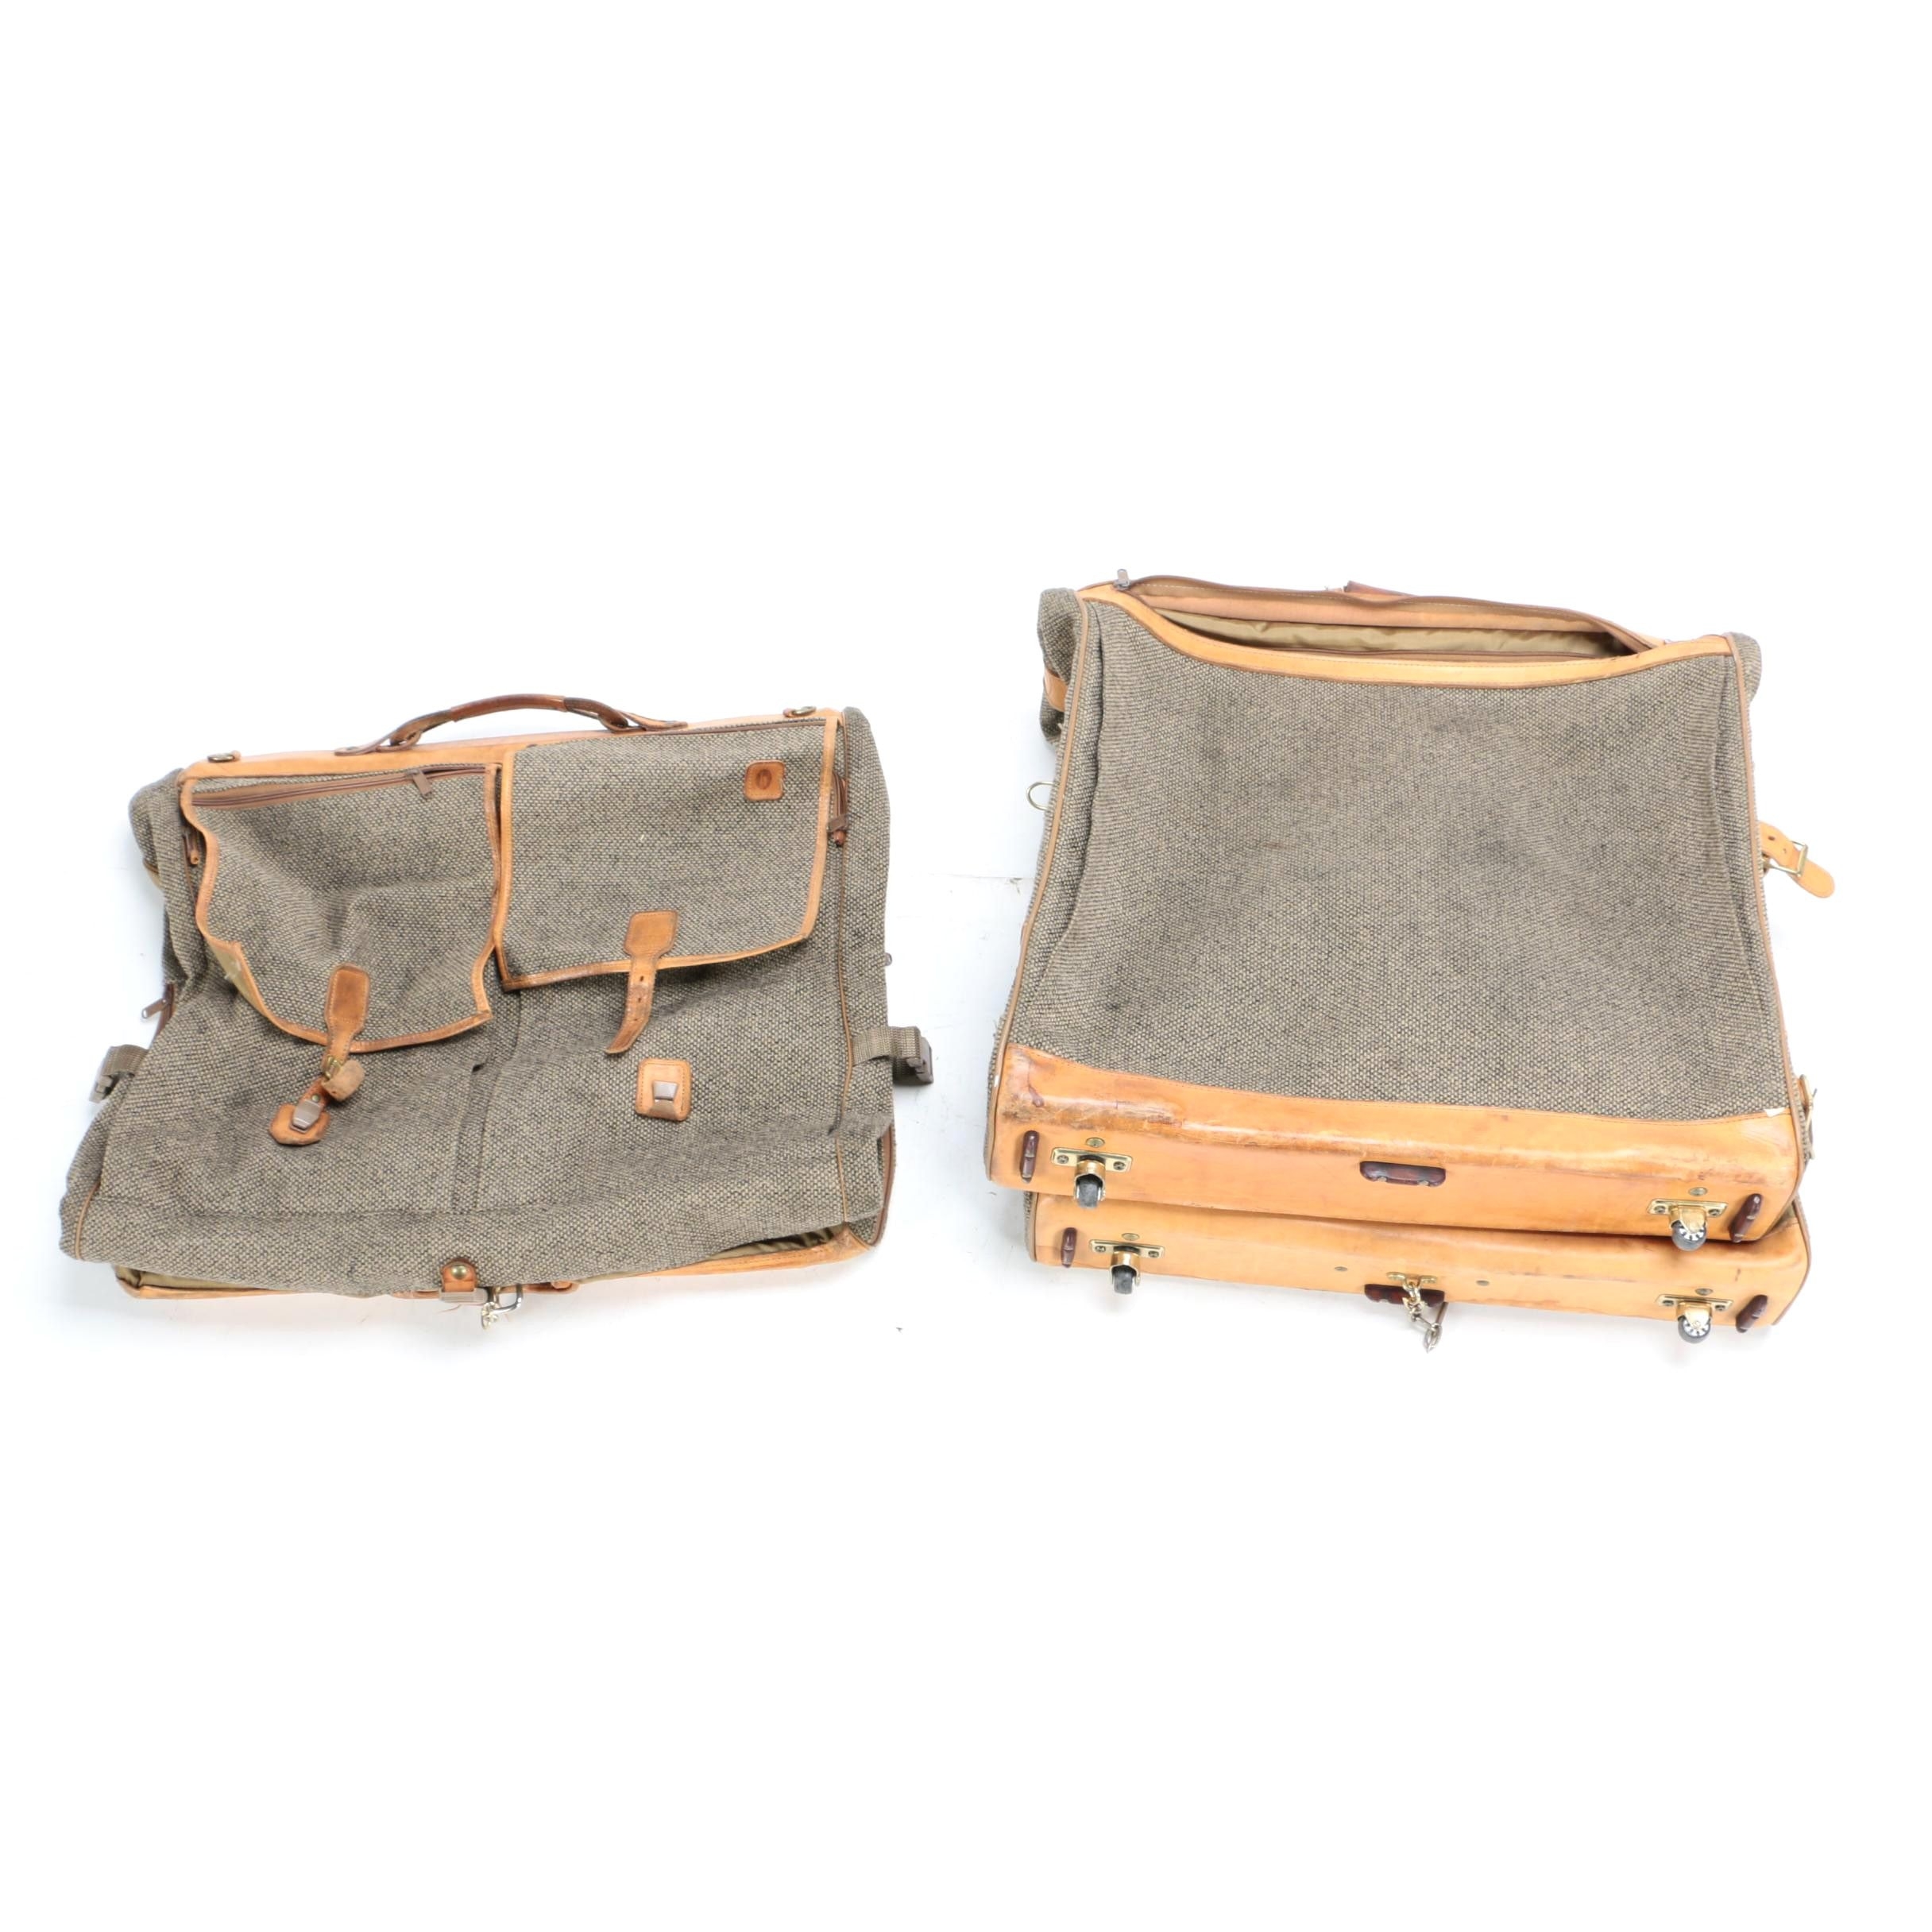 Vintage Hartmann Tweed and Leather Luggage Garment Bags